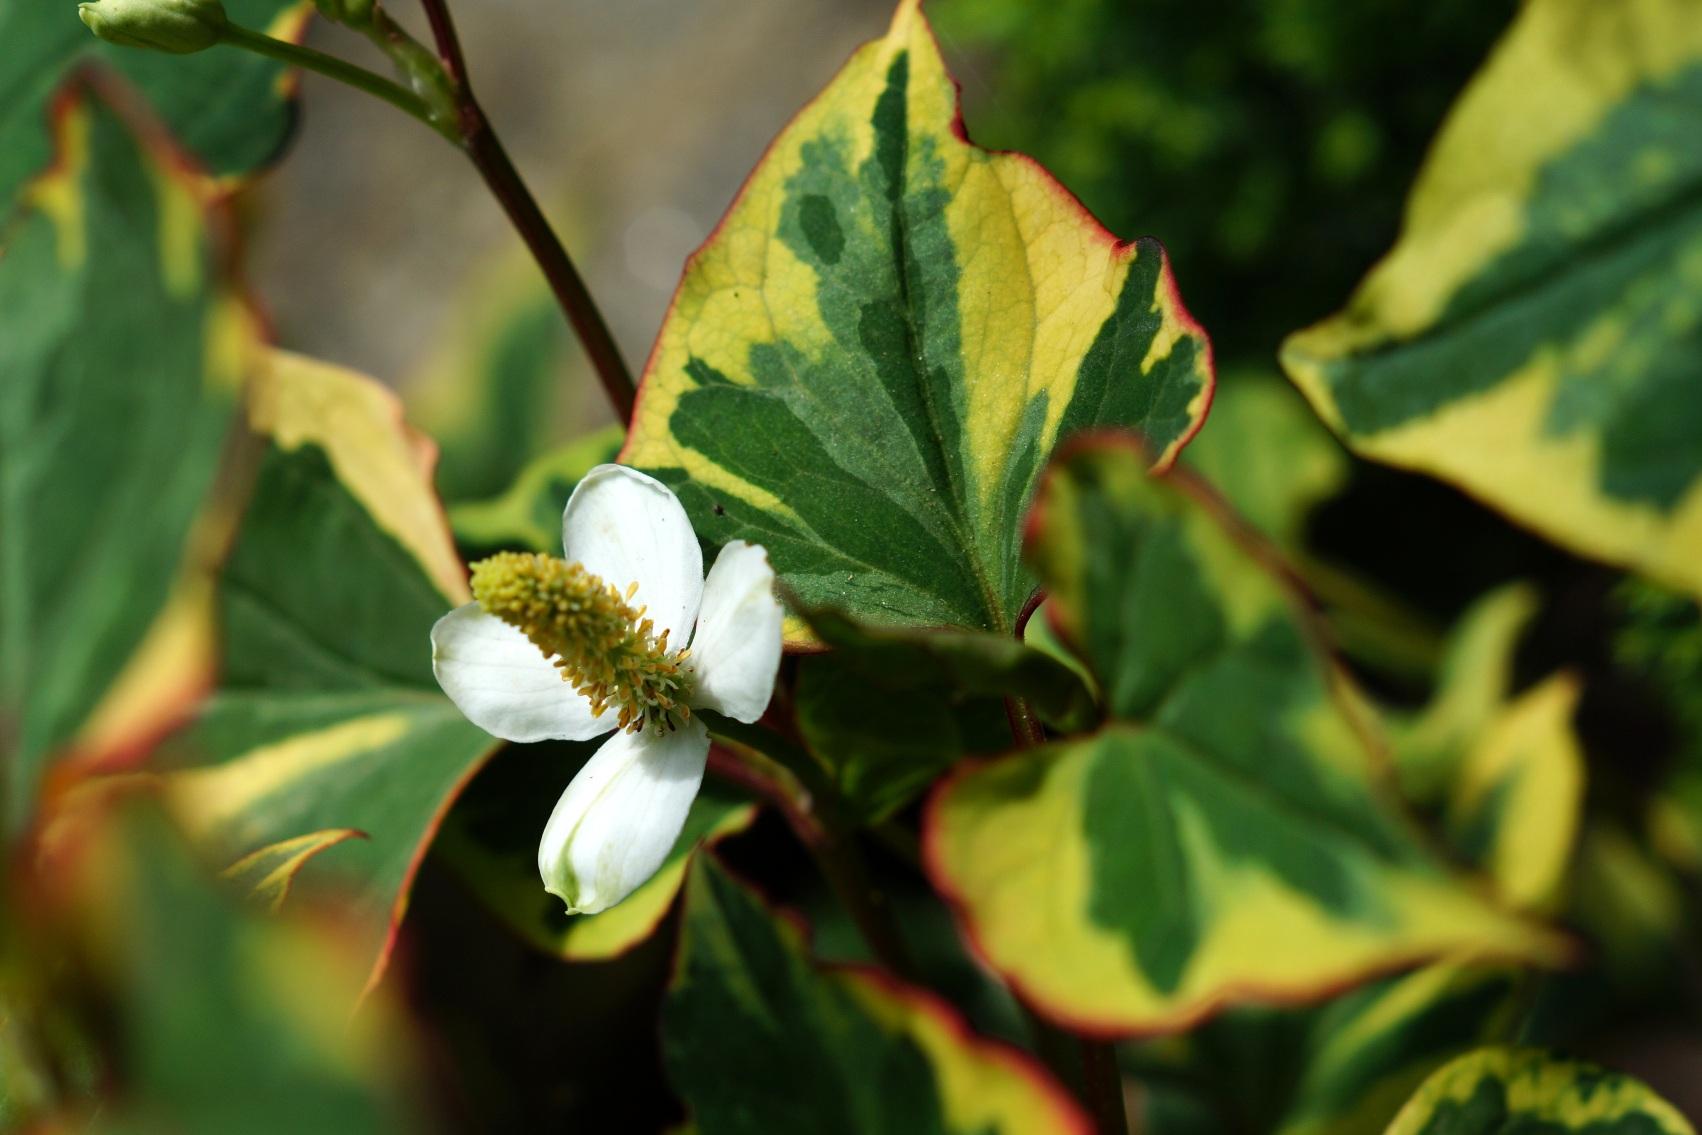 Houttuynia cordata – houtujnia sercowata